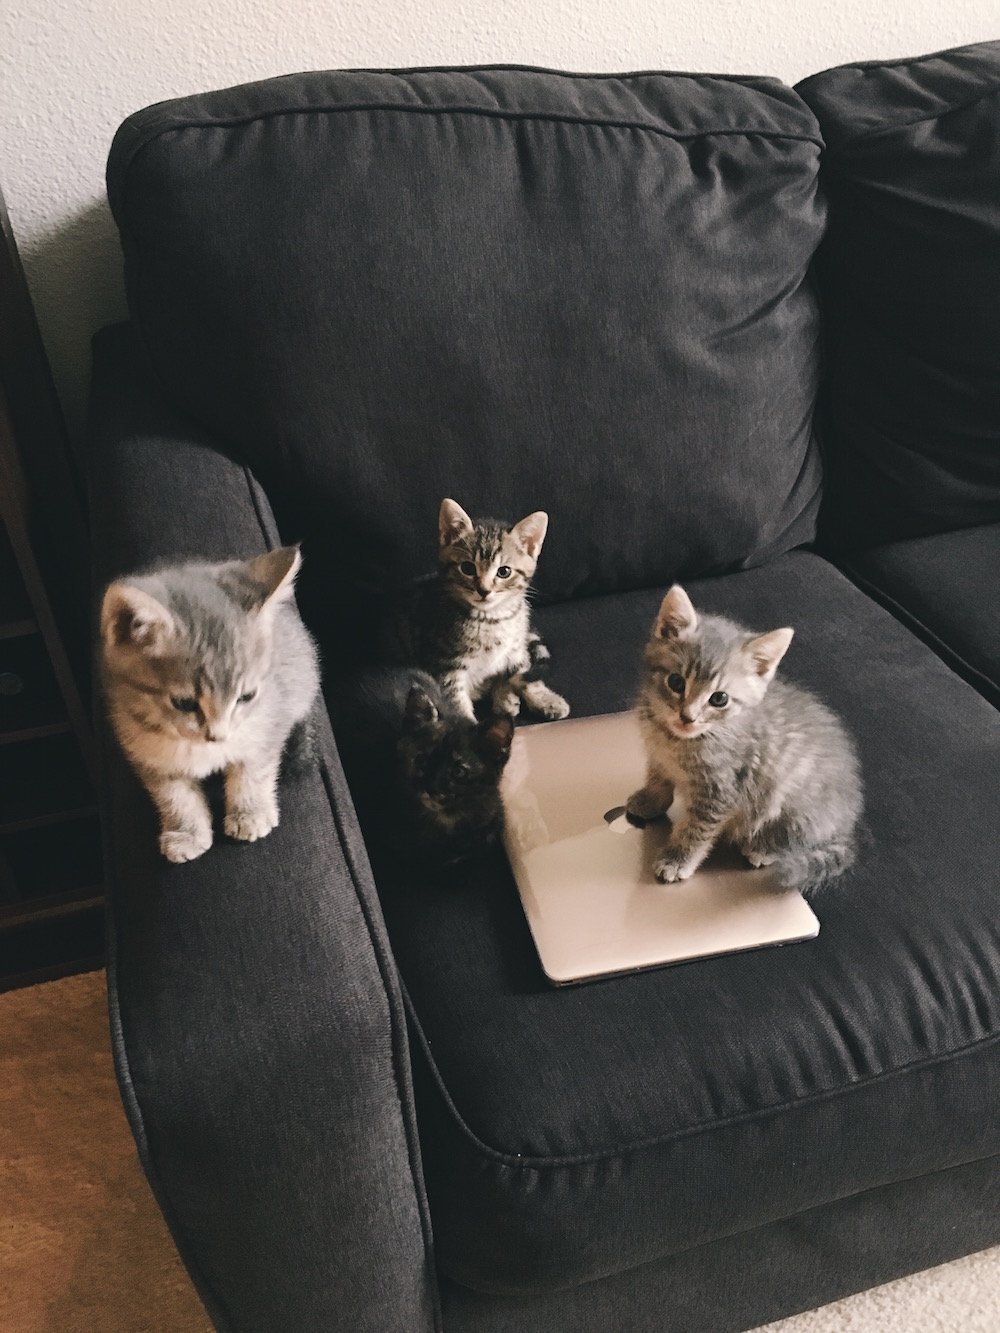 Four kittens on laptop